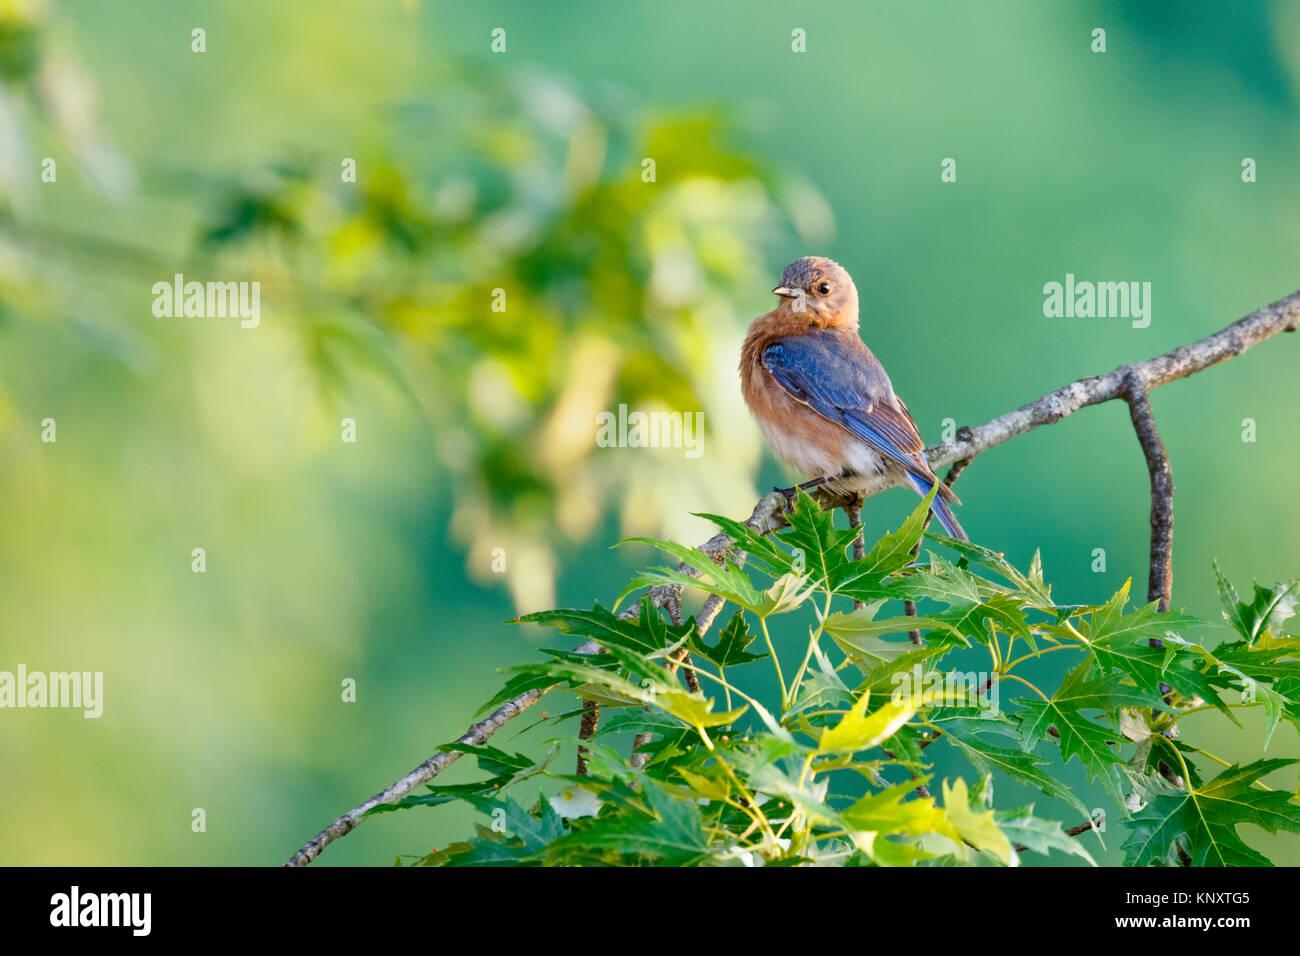 Bluebird in Tree - Stock Image